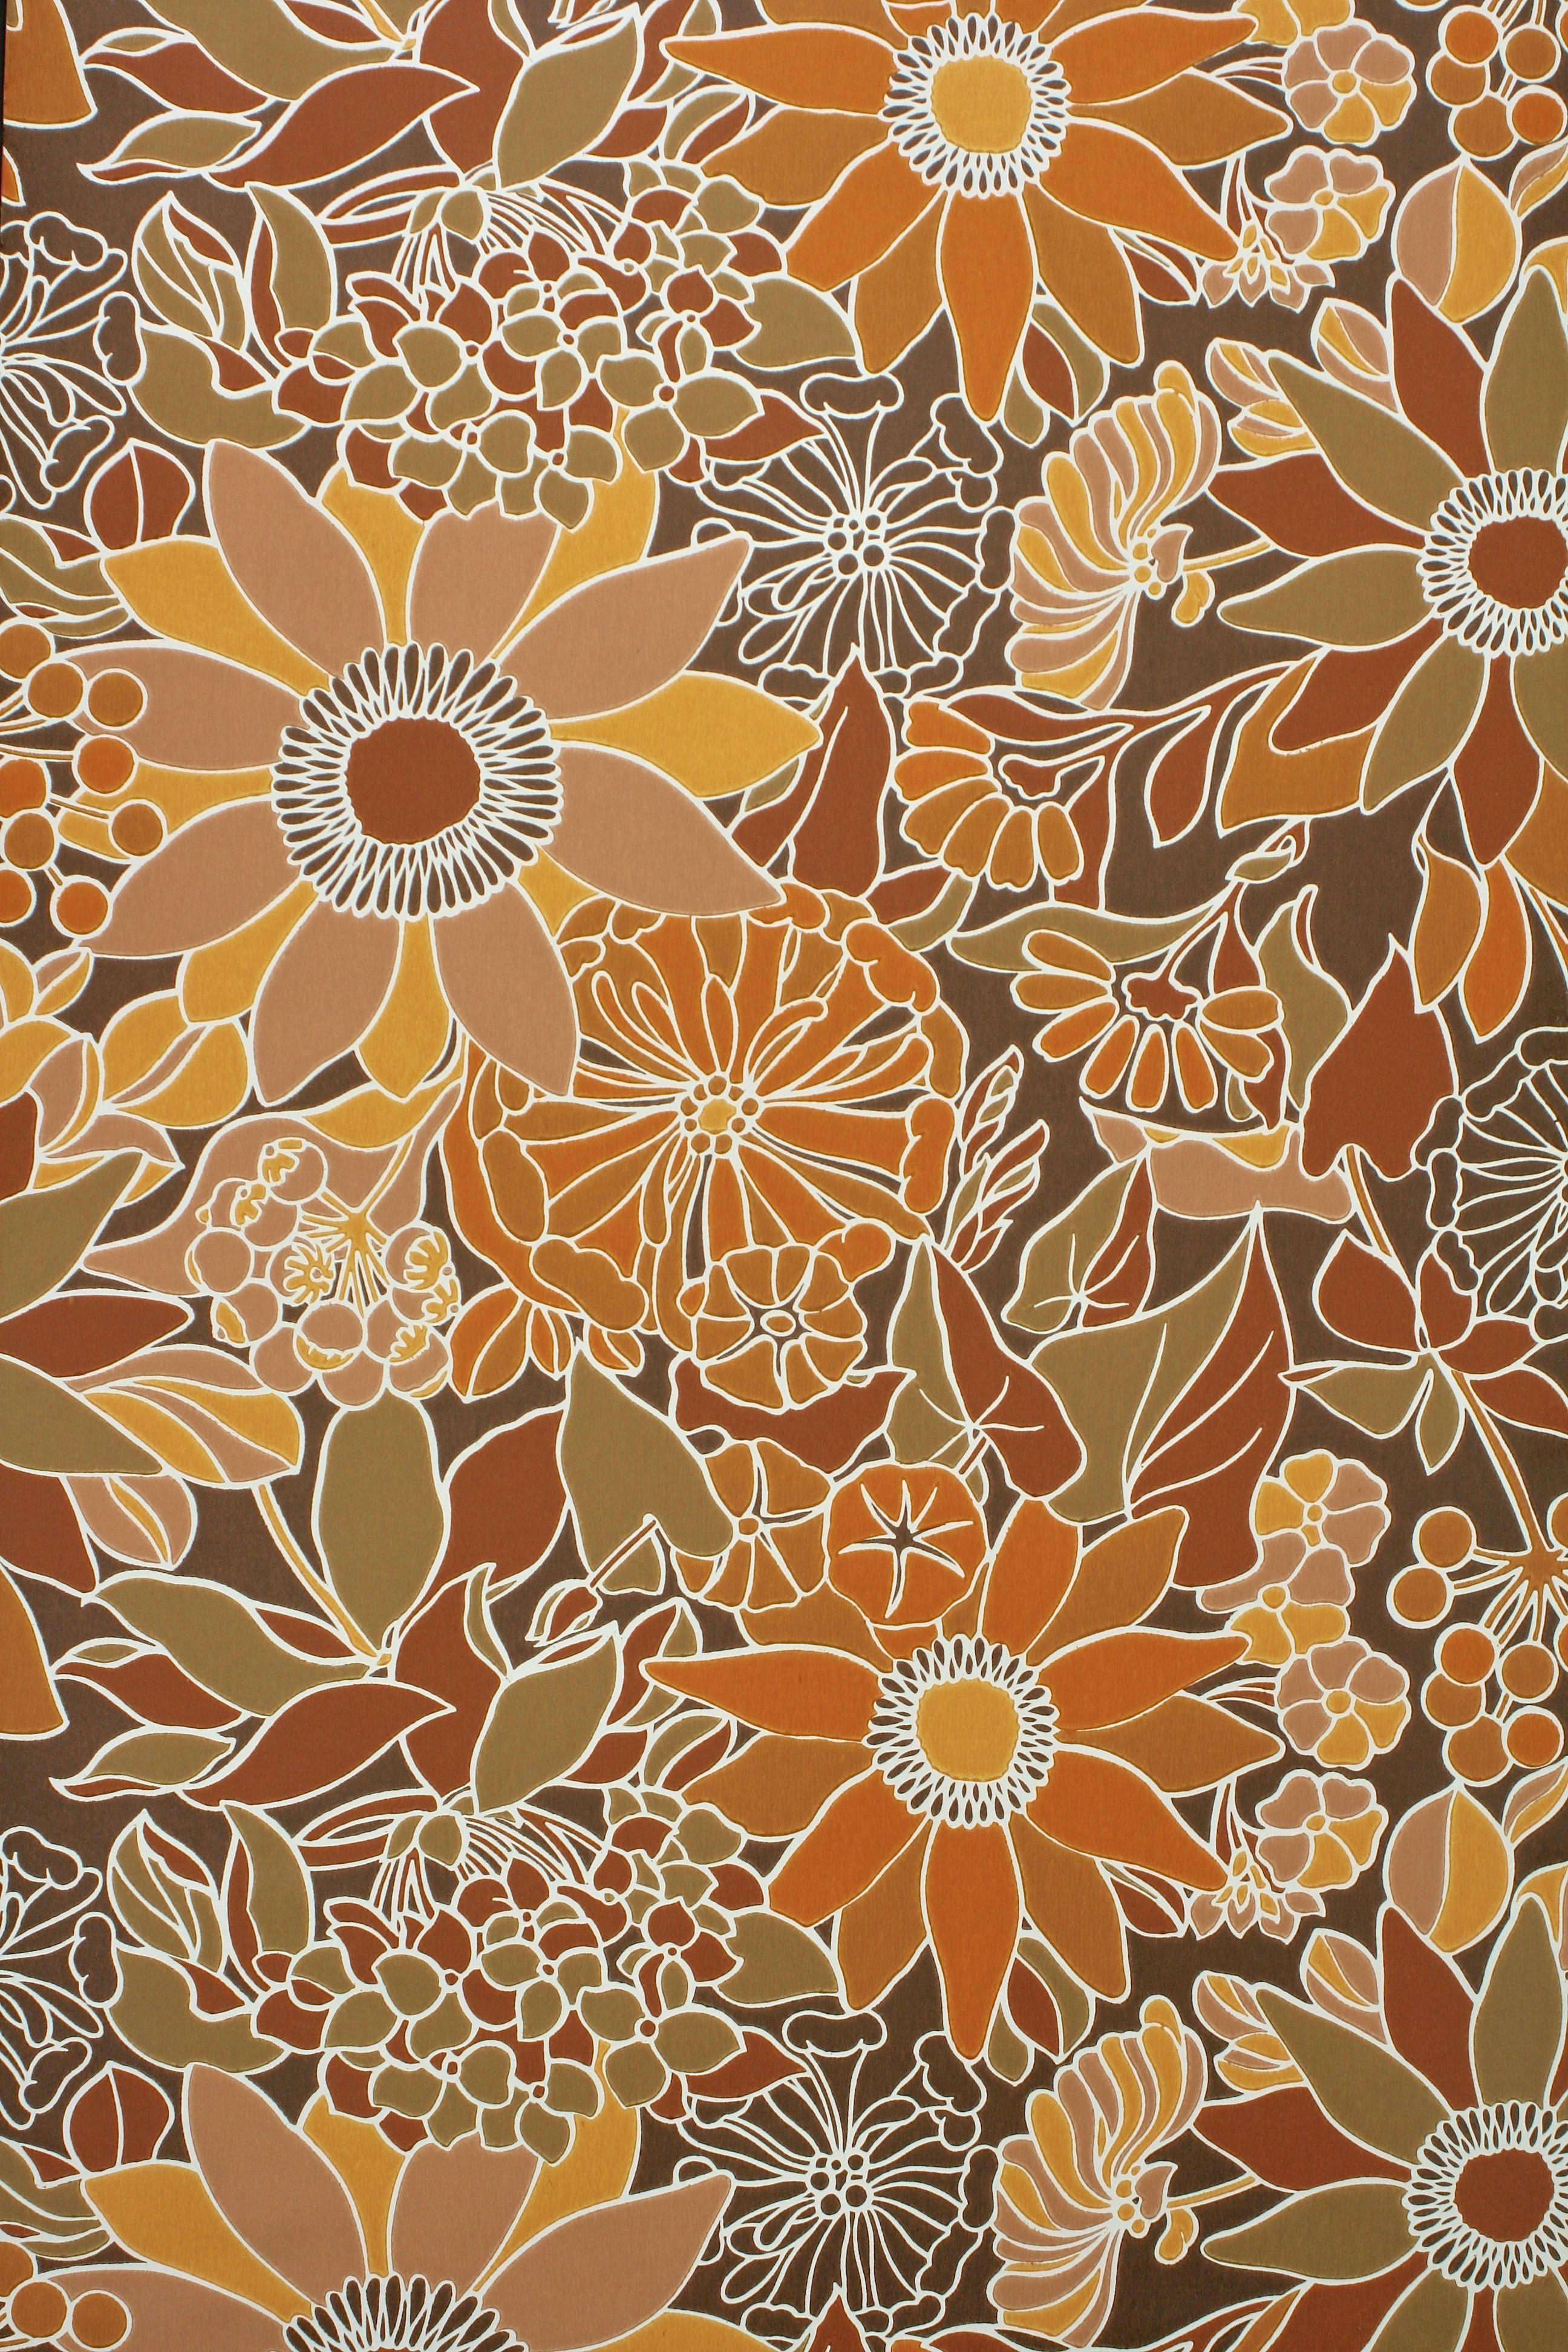 Aesthetic Vintage Hippie Wallpapers - Wallpaper Cave